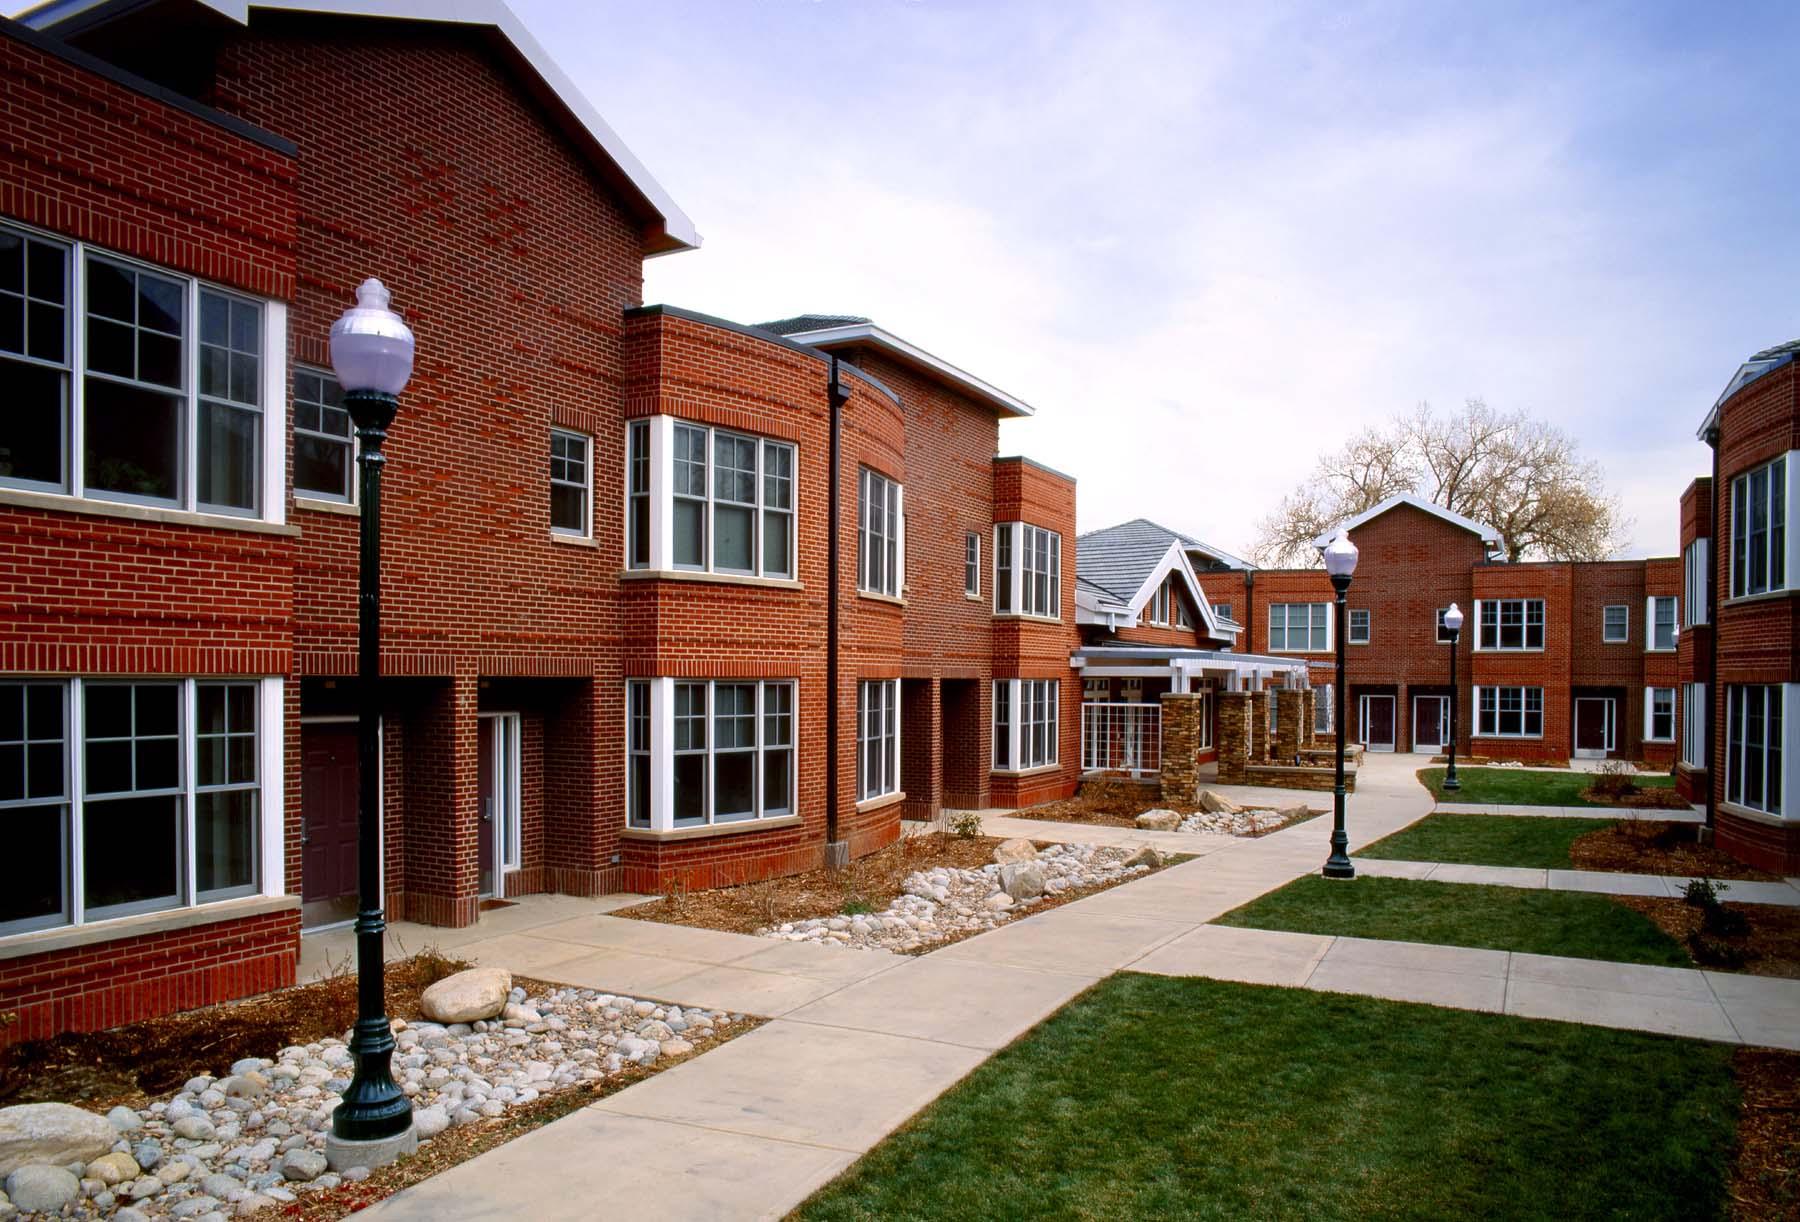 REGIS STUDENT HOUSING -  4 New Buildings totaling 48,577 SF